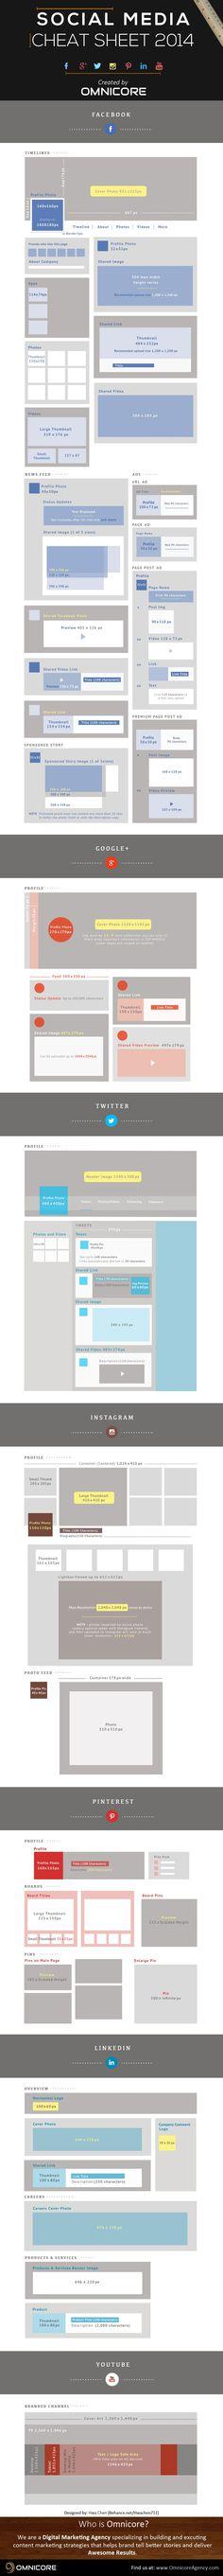 Social Media Cheat Sheet 2016  Must-Have Image Sizes! Marketing Digital 849ed5f9e867